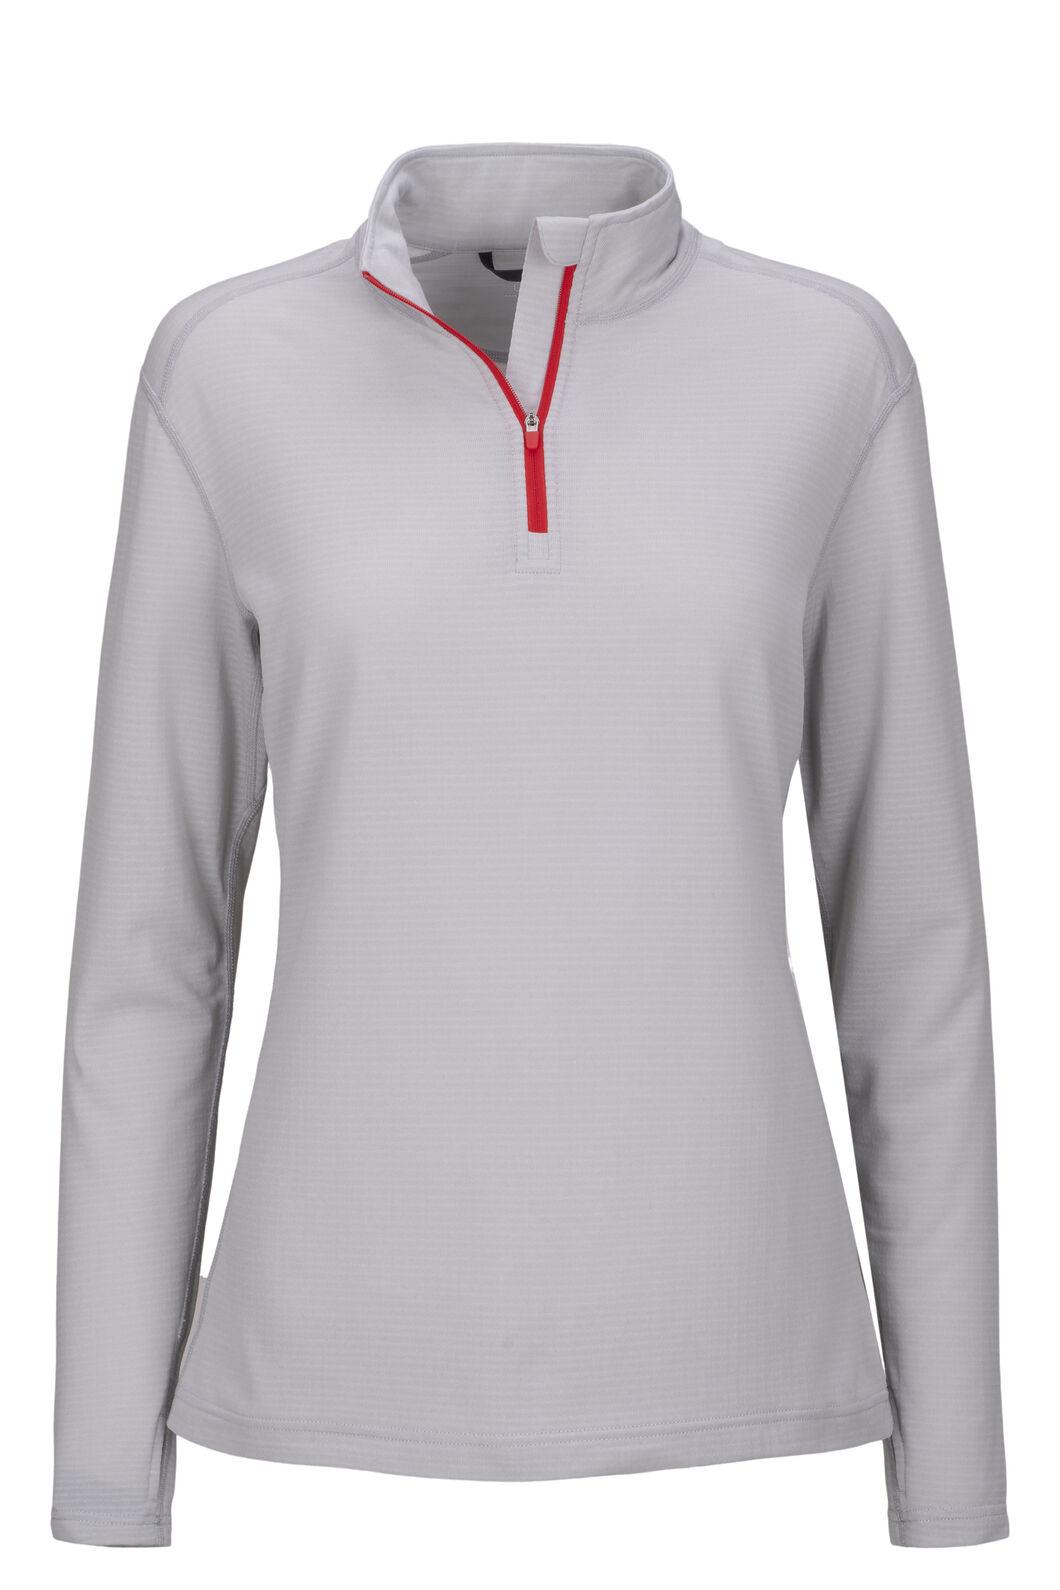 Macpac Prothermal Polartec® Long Sleeve Top — Women's, Dawn Blue, hi-res